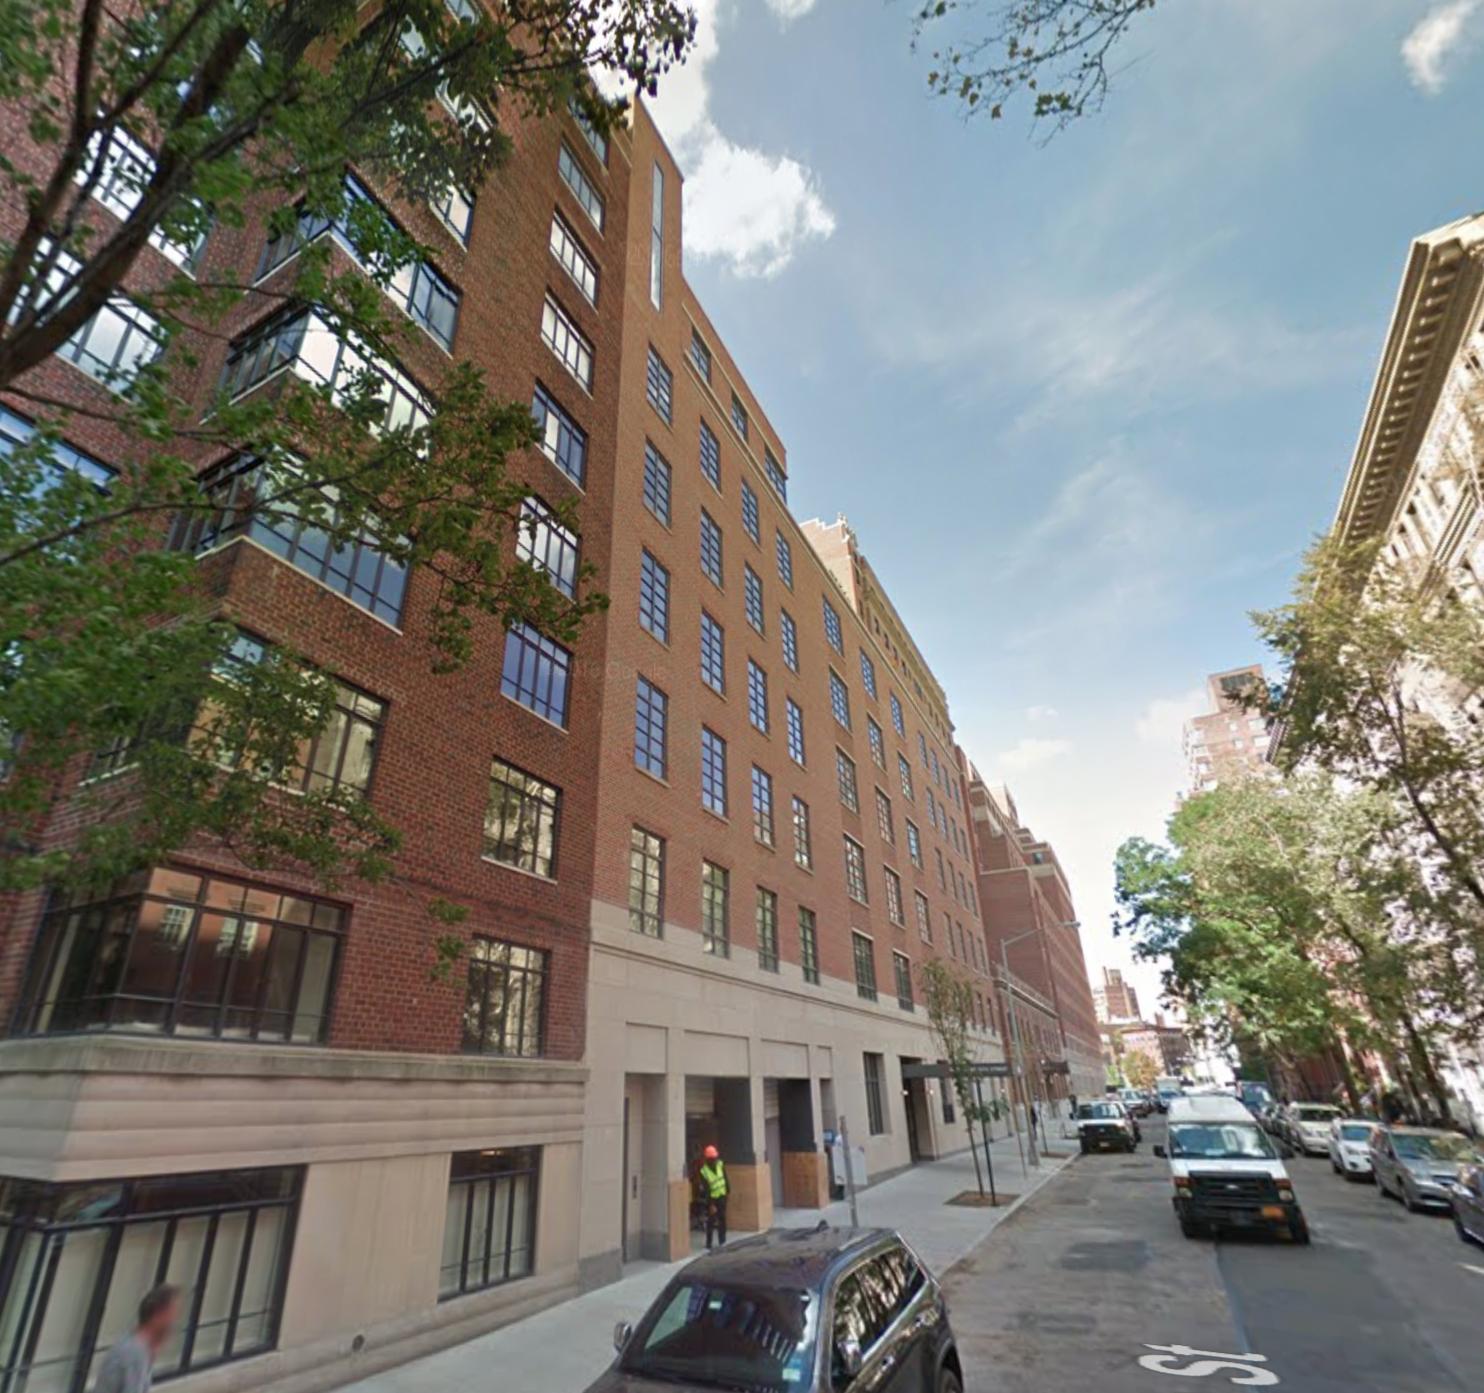 140 West 12th Street, September 2016. Via Google Maps